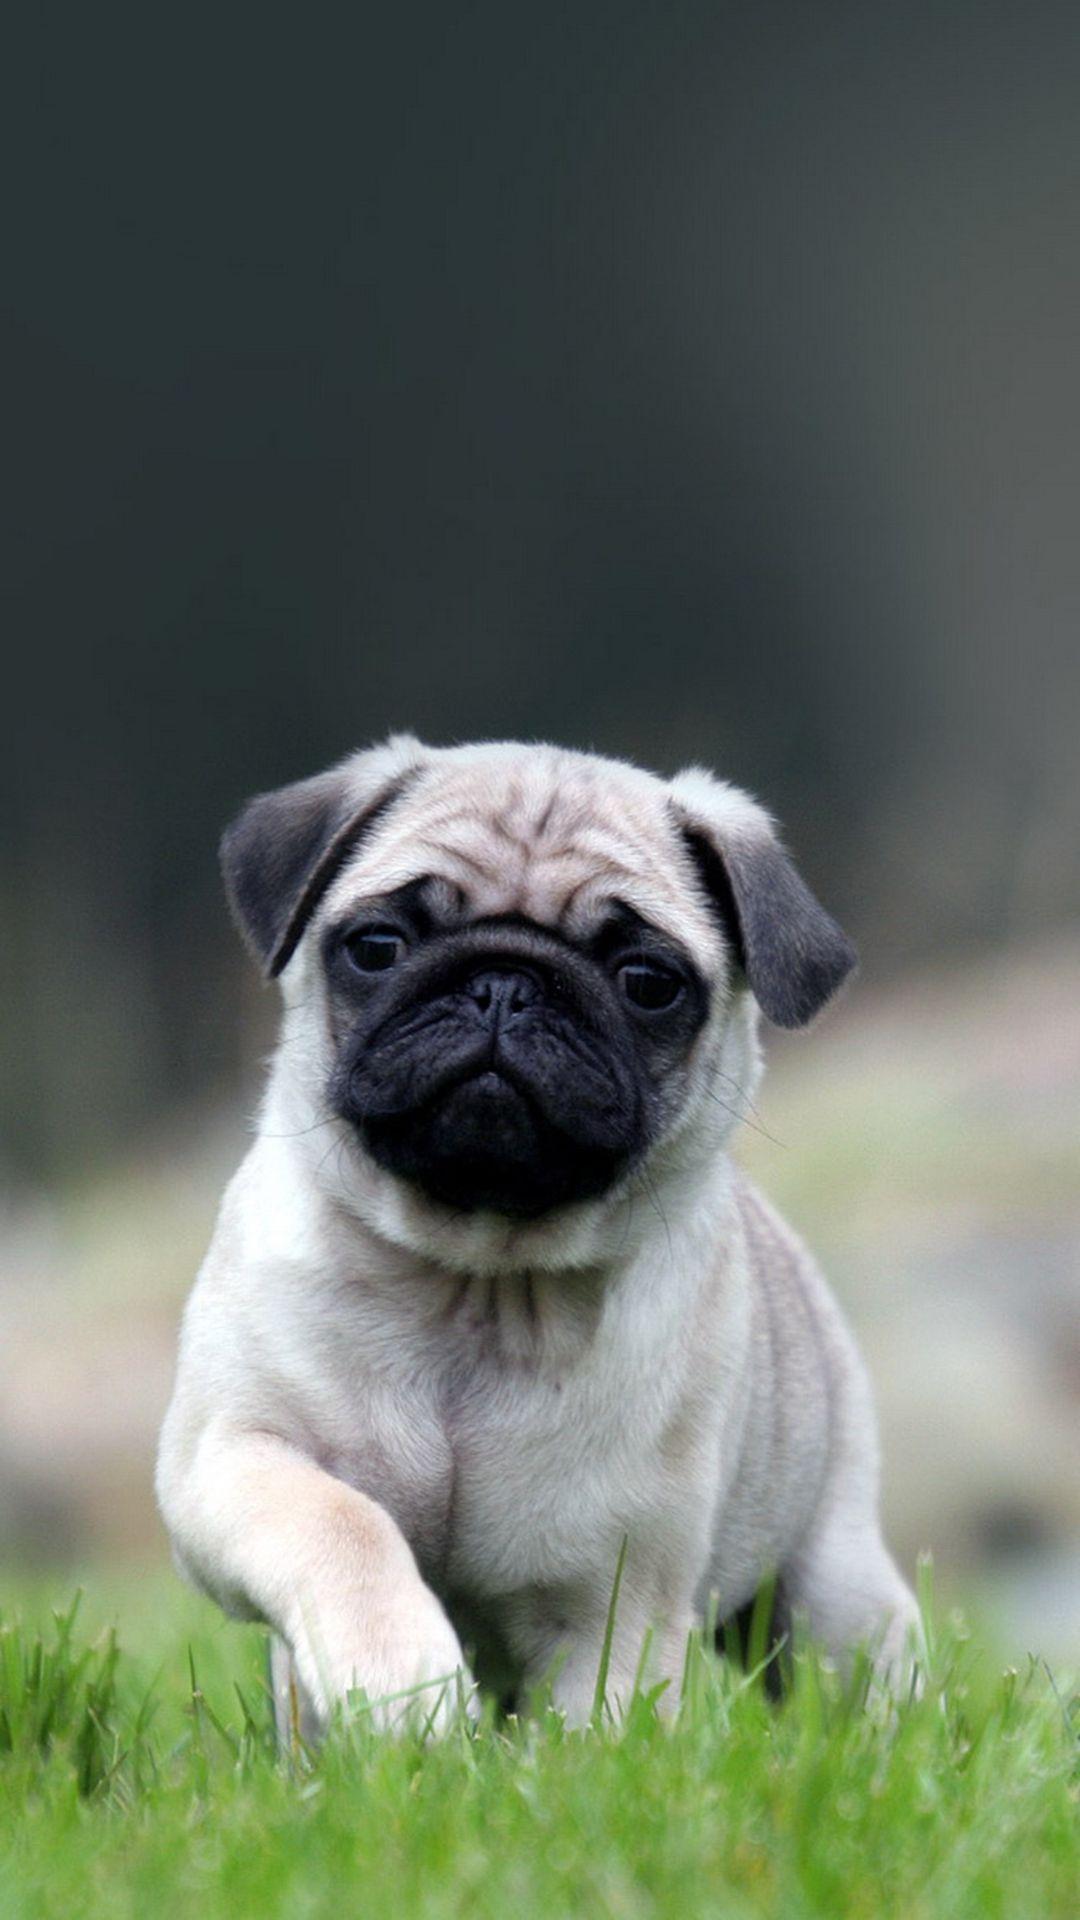 Must see Pug Canine Adorable Dog - 5280bf3dbd84e8938fa1585ac9189bca  Snapshot_966056  .jpg